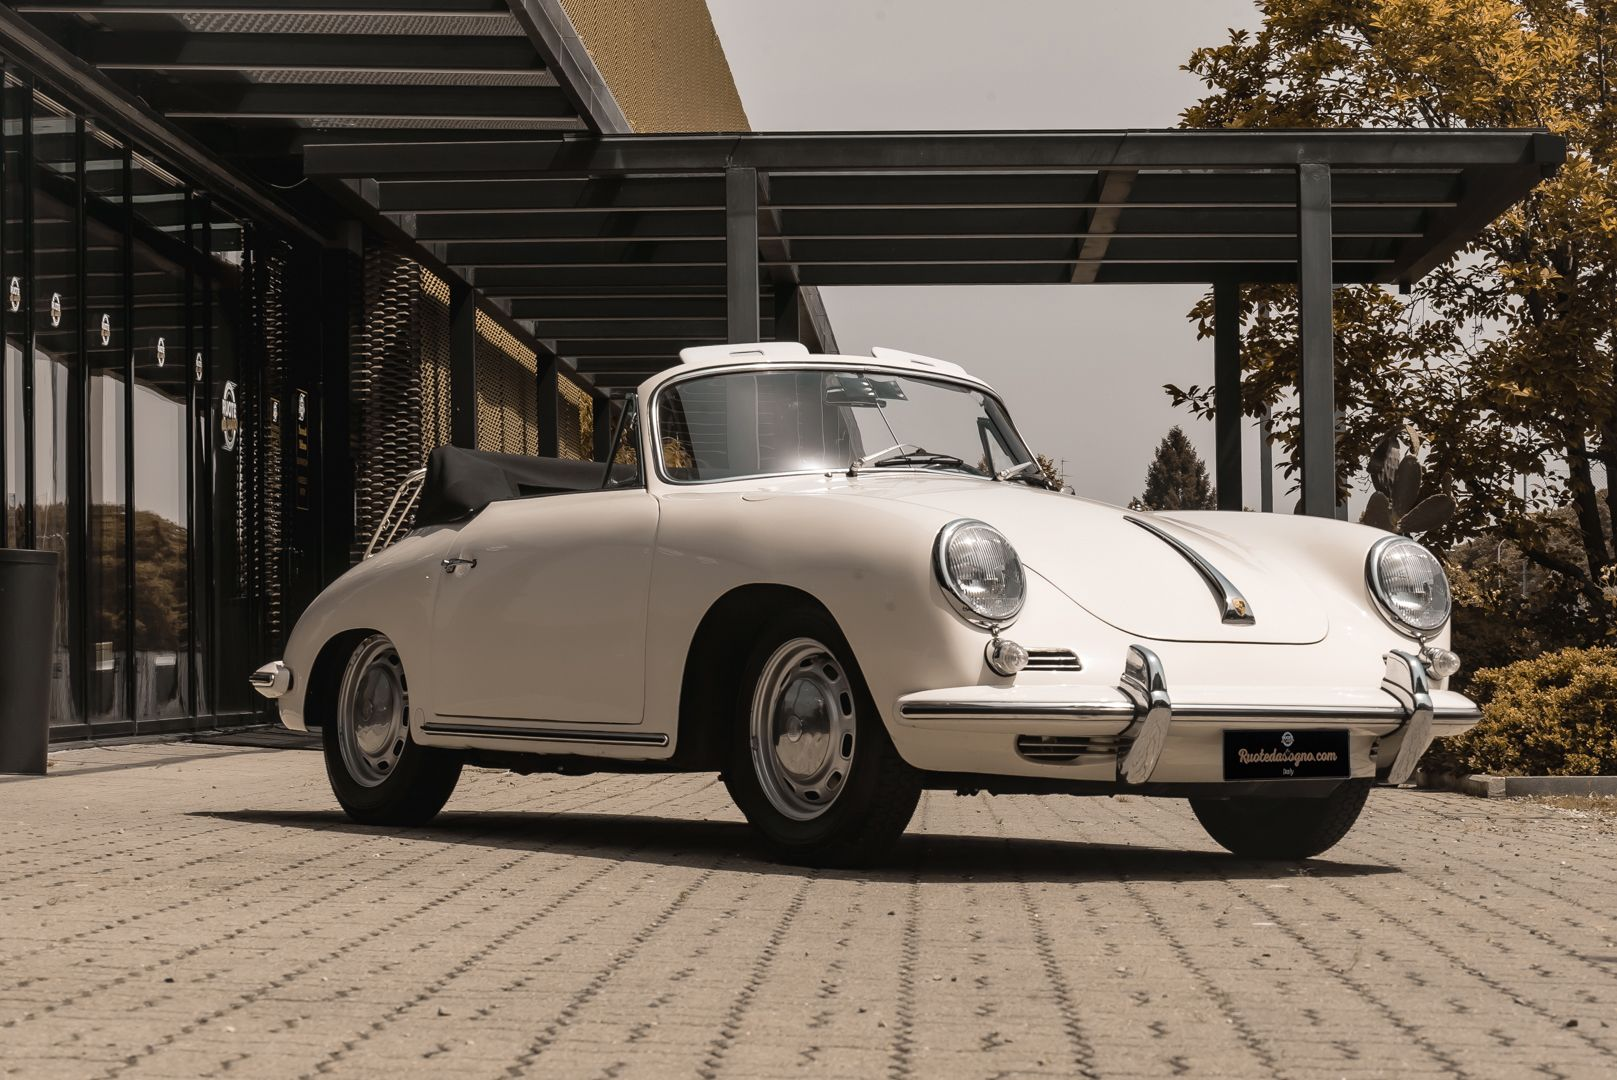 1964 PORSCHE 356 C Cabriolet 1600 SC 75439